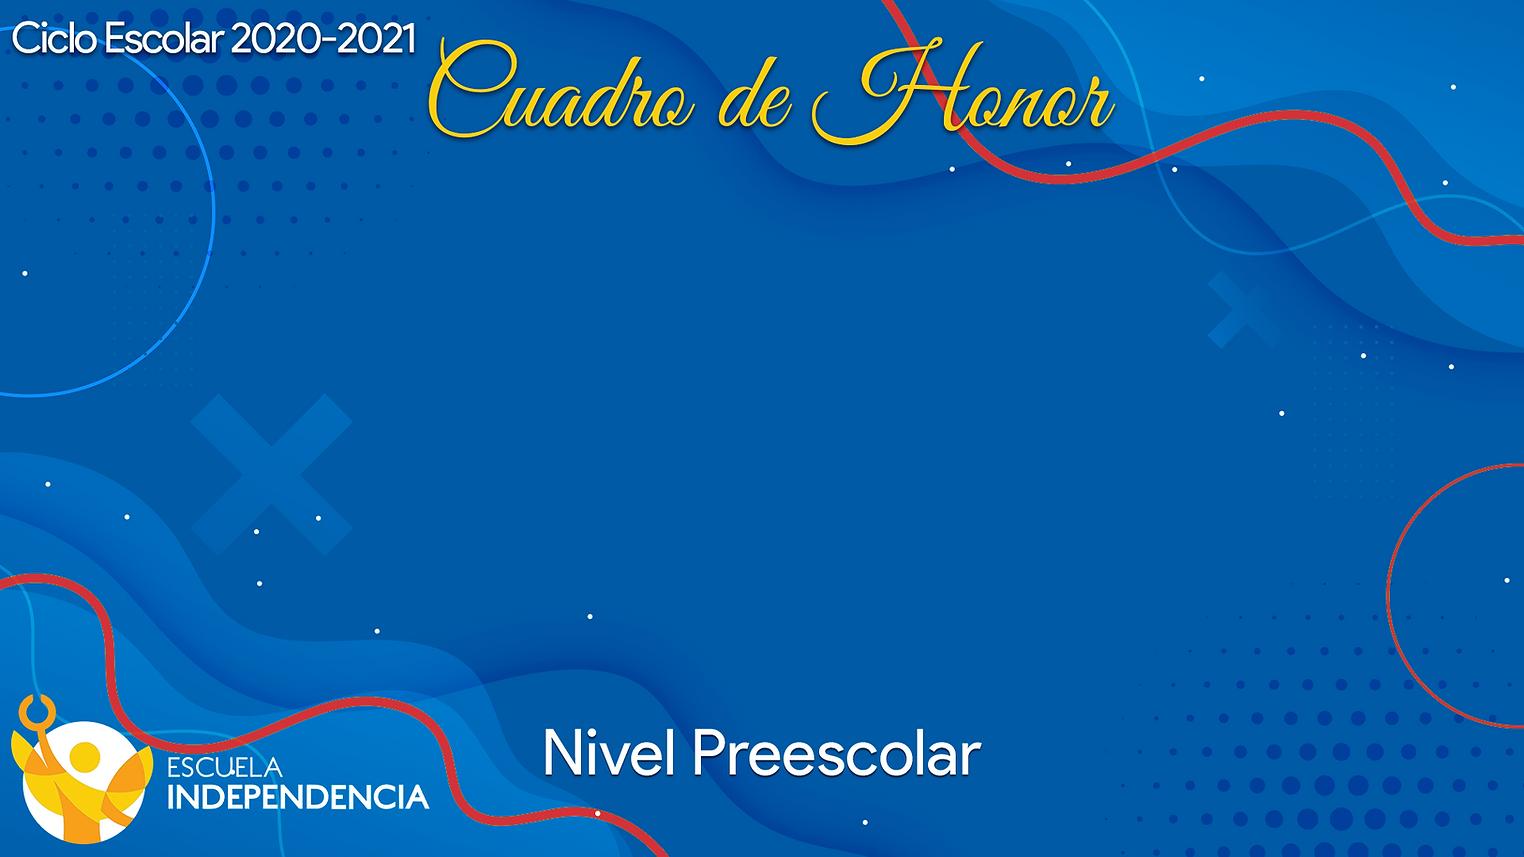 Fondo Nivel Preescolar.png